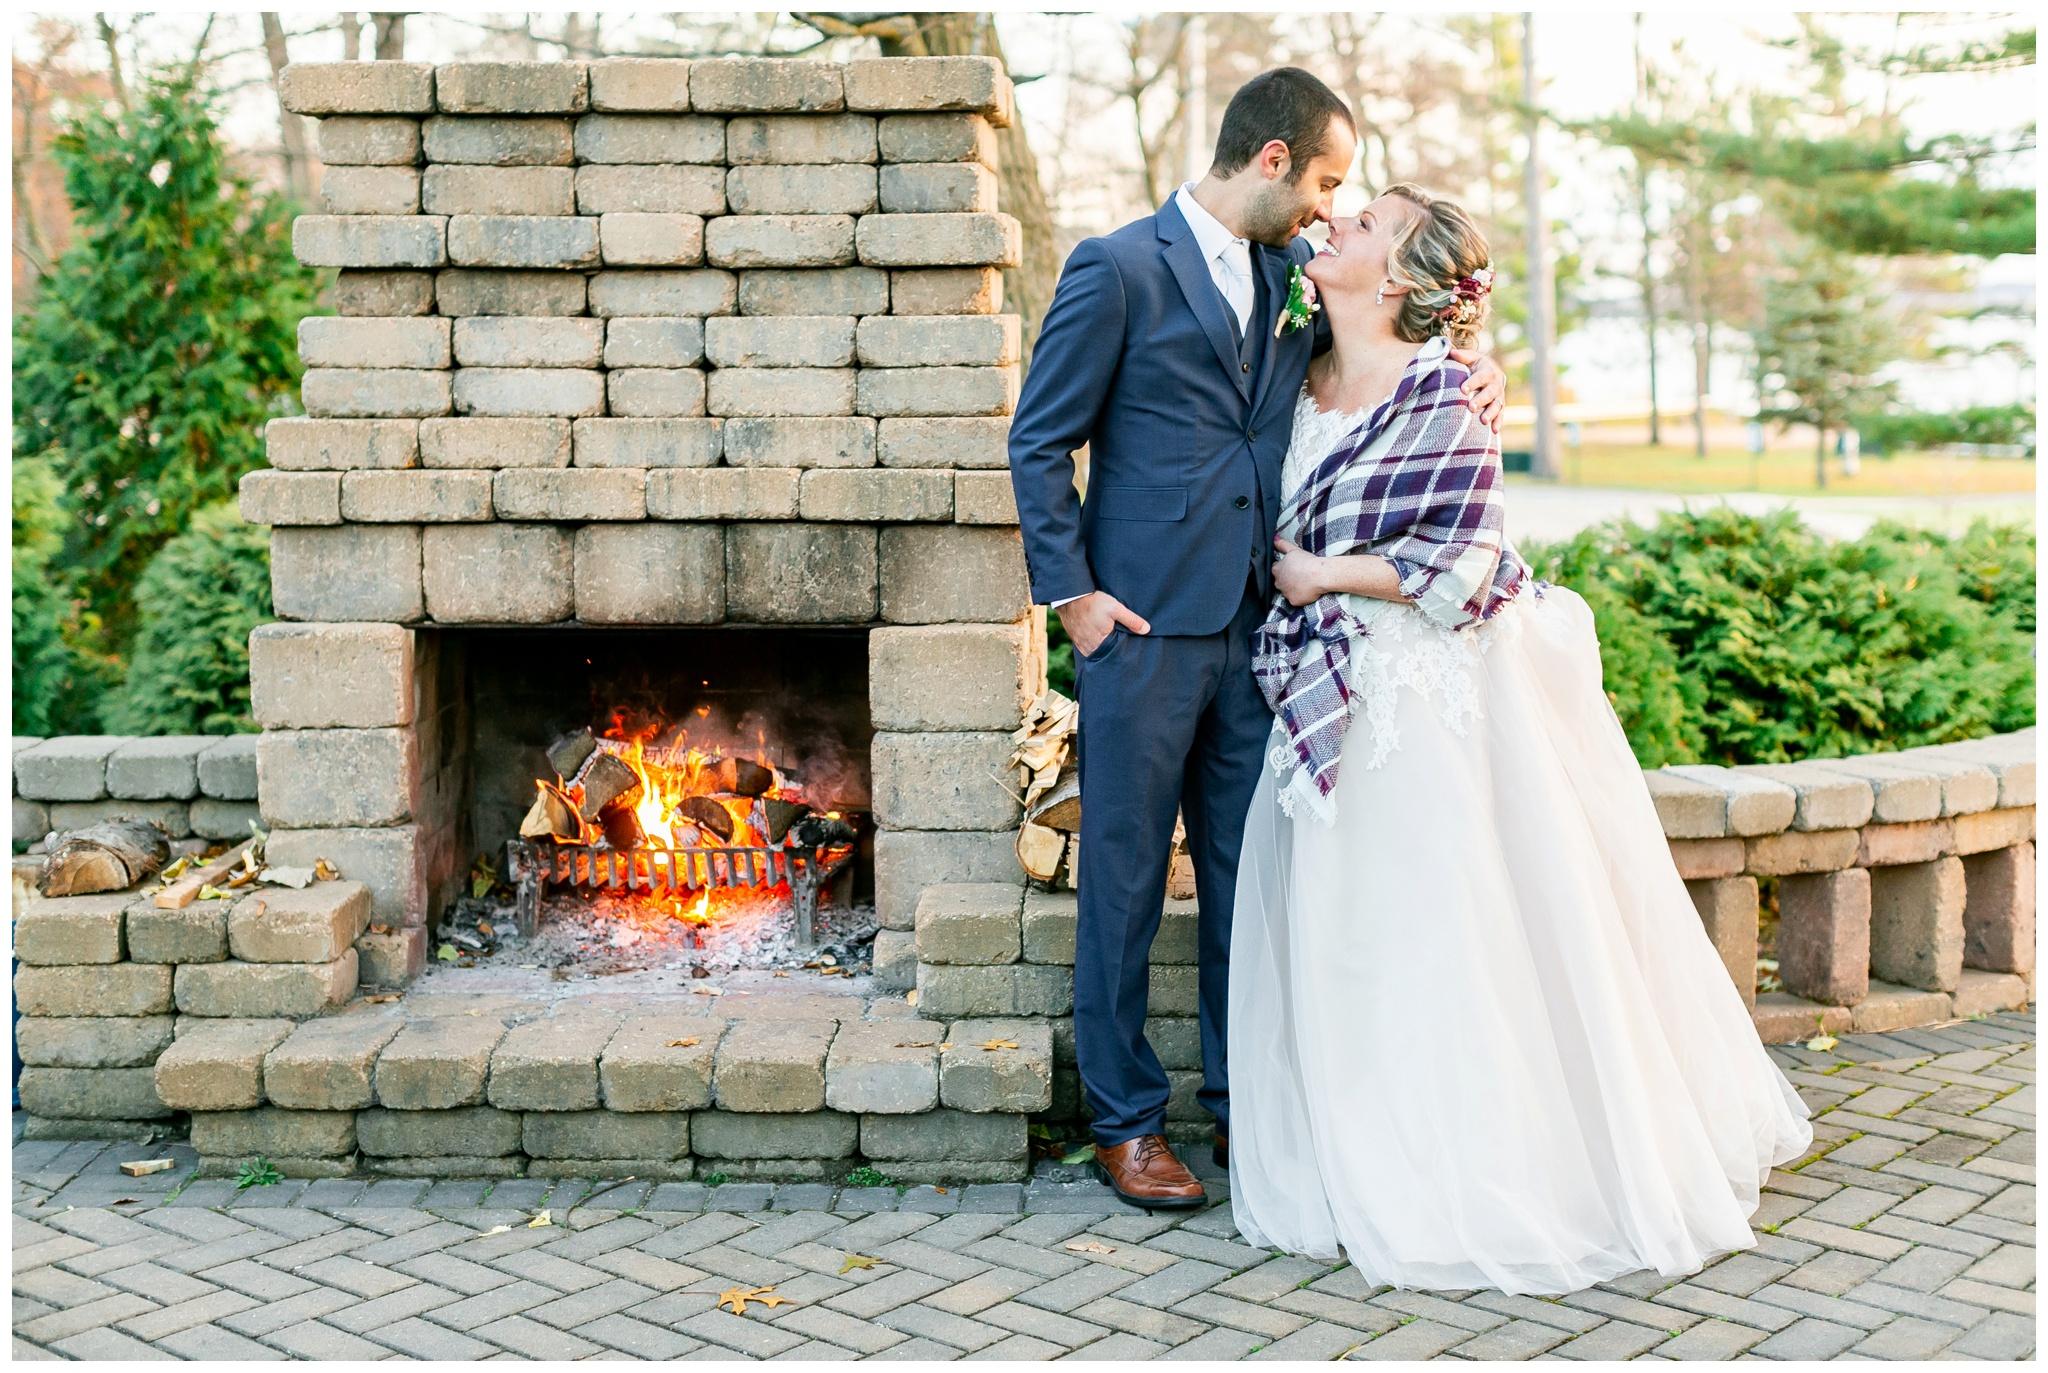 Shawano_County_park_Wedding_Caynay_Photo_Madison_Wi_2349.jpg